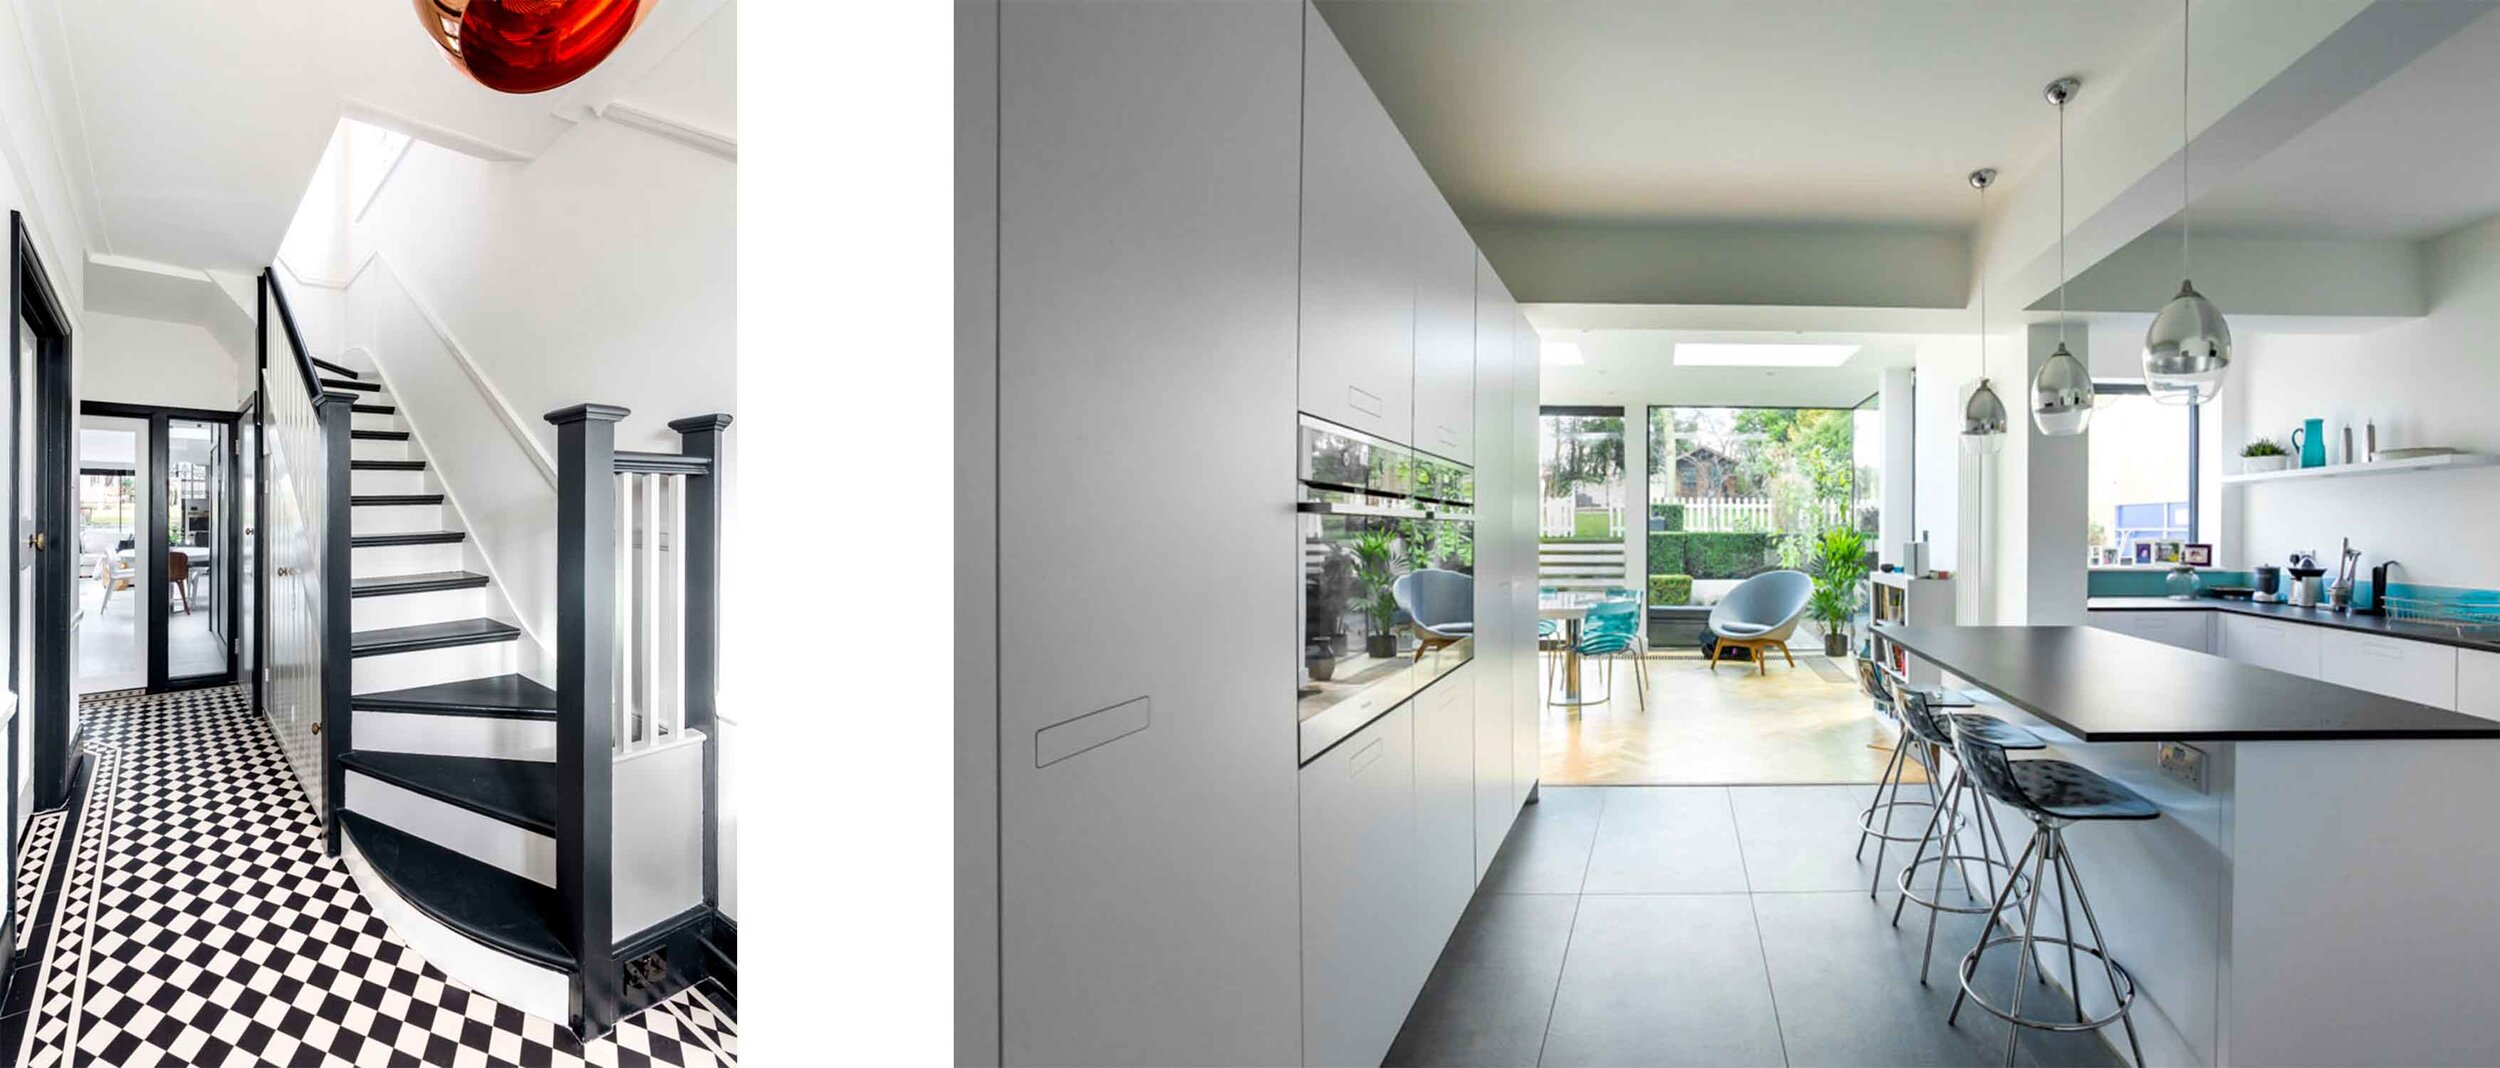 interiors photography 4